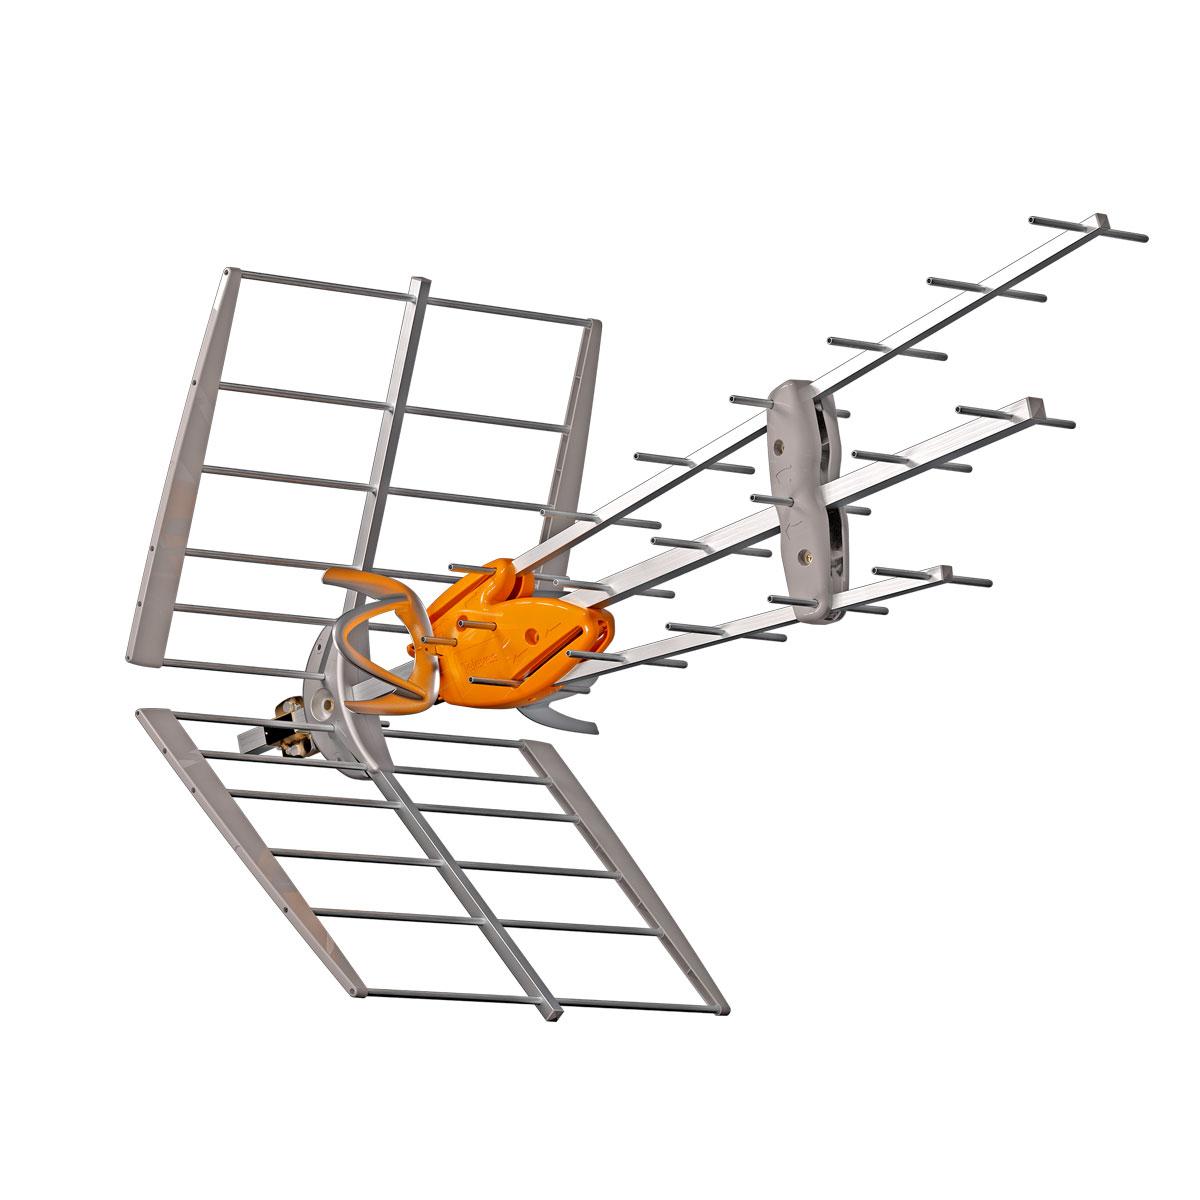 Antenna DAT BOSS UHF(C21-60) G45 dBi - Singolo